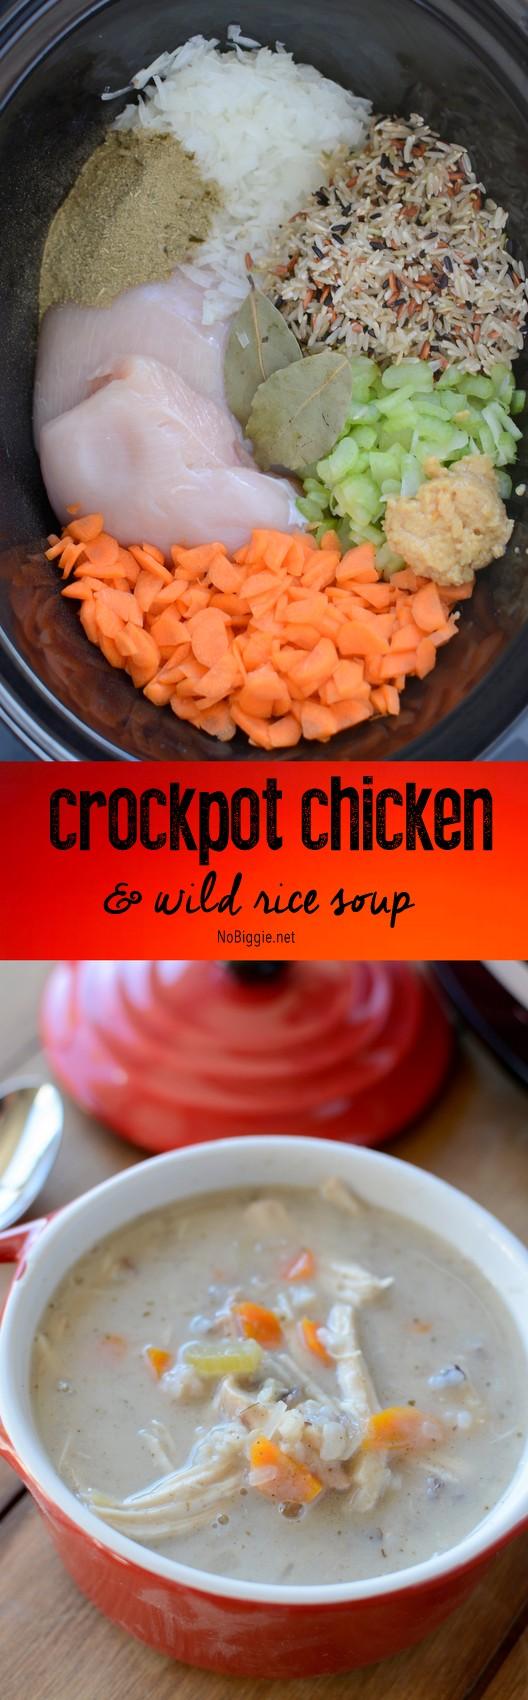 creamy crockpot chicken and wild rice soup | NoBiggie.net